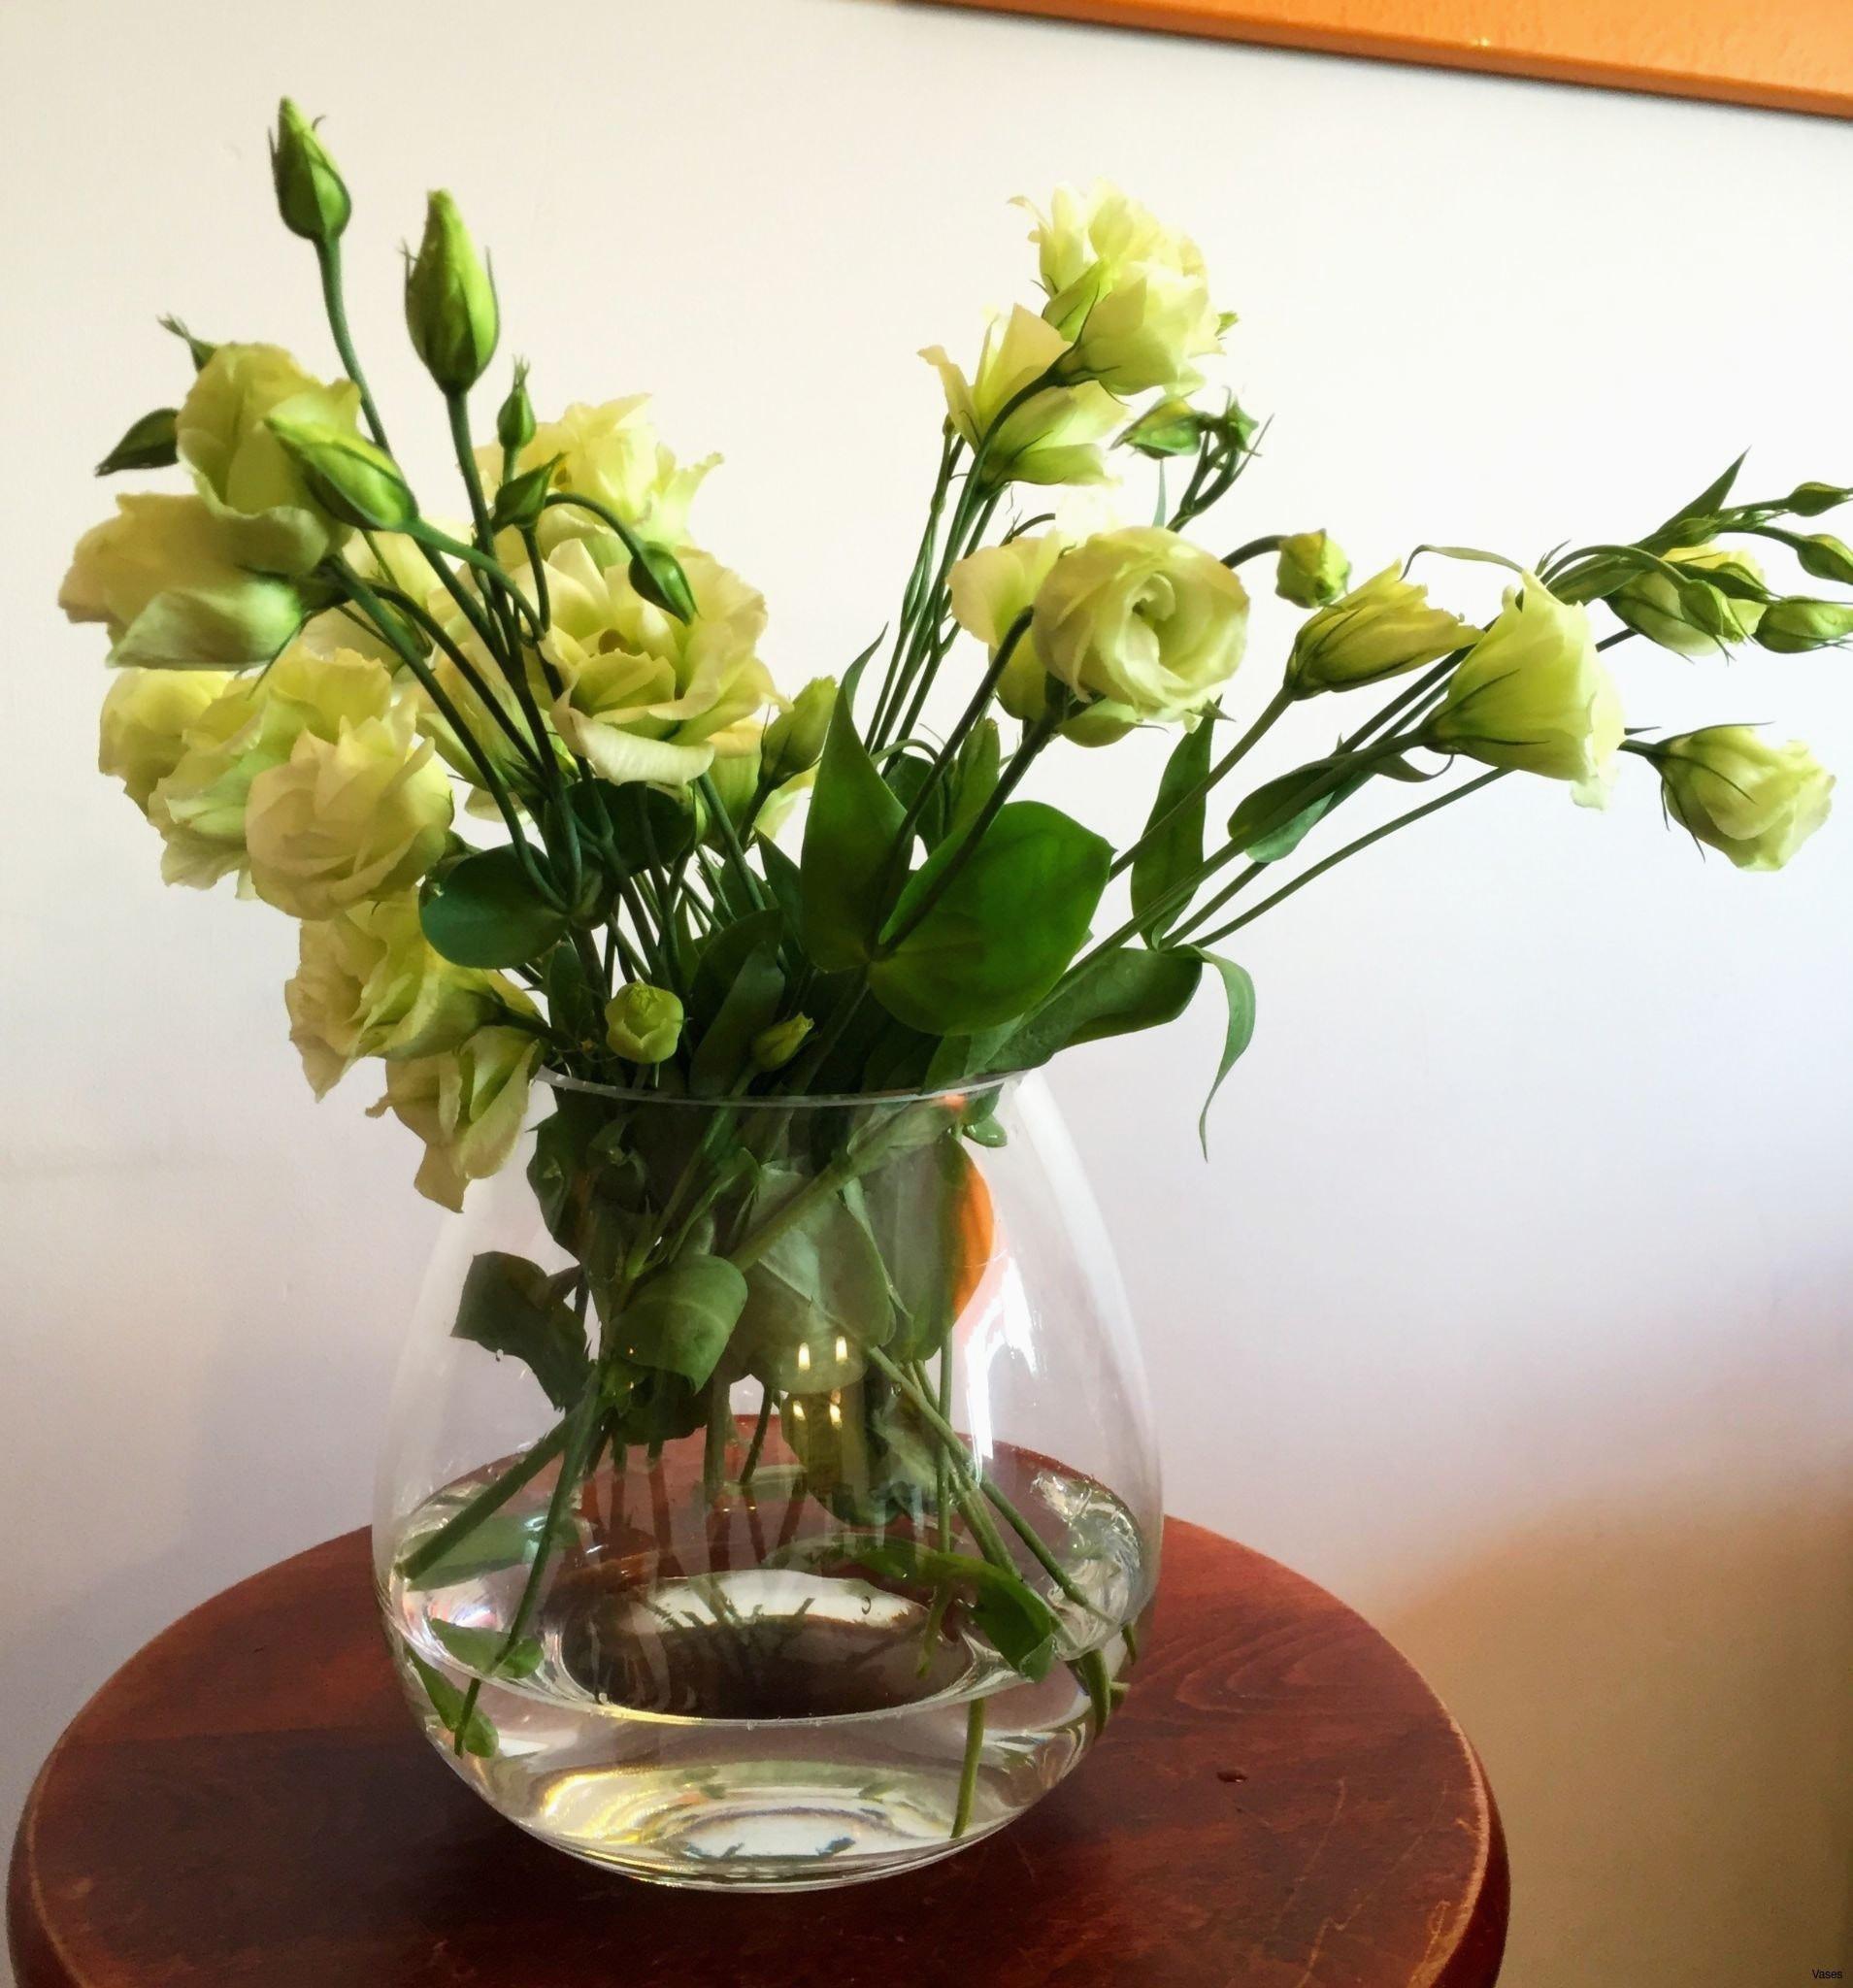 big vase flower arrangements of 27 various flower arrangement for dining table thunder for dining table centerpieces lovely flower vase table 04h vases tablei 0d clipart dining base end design